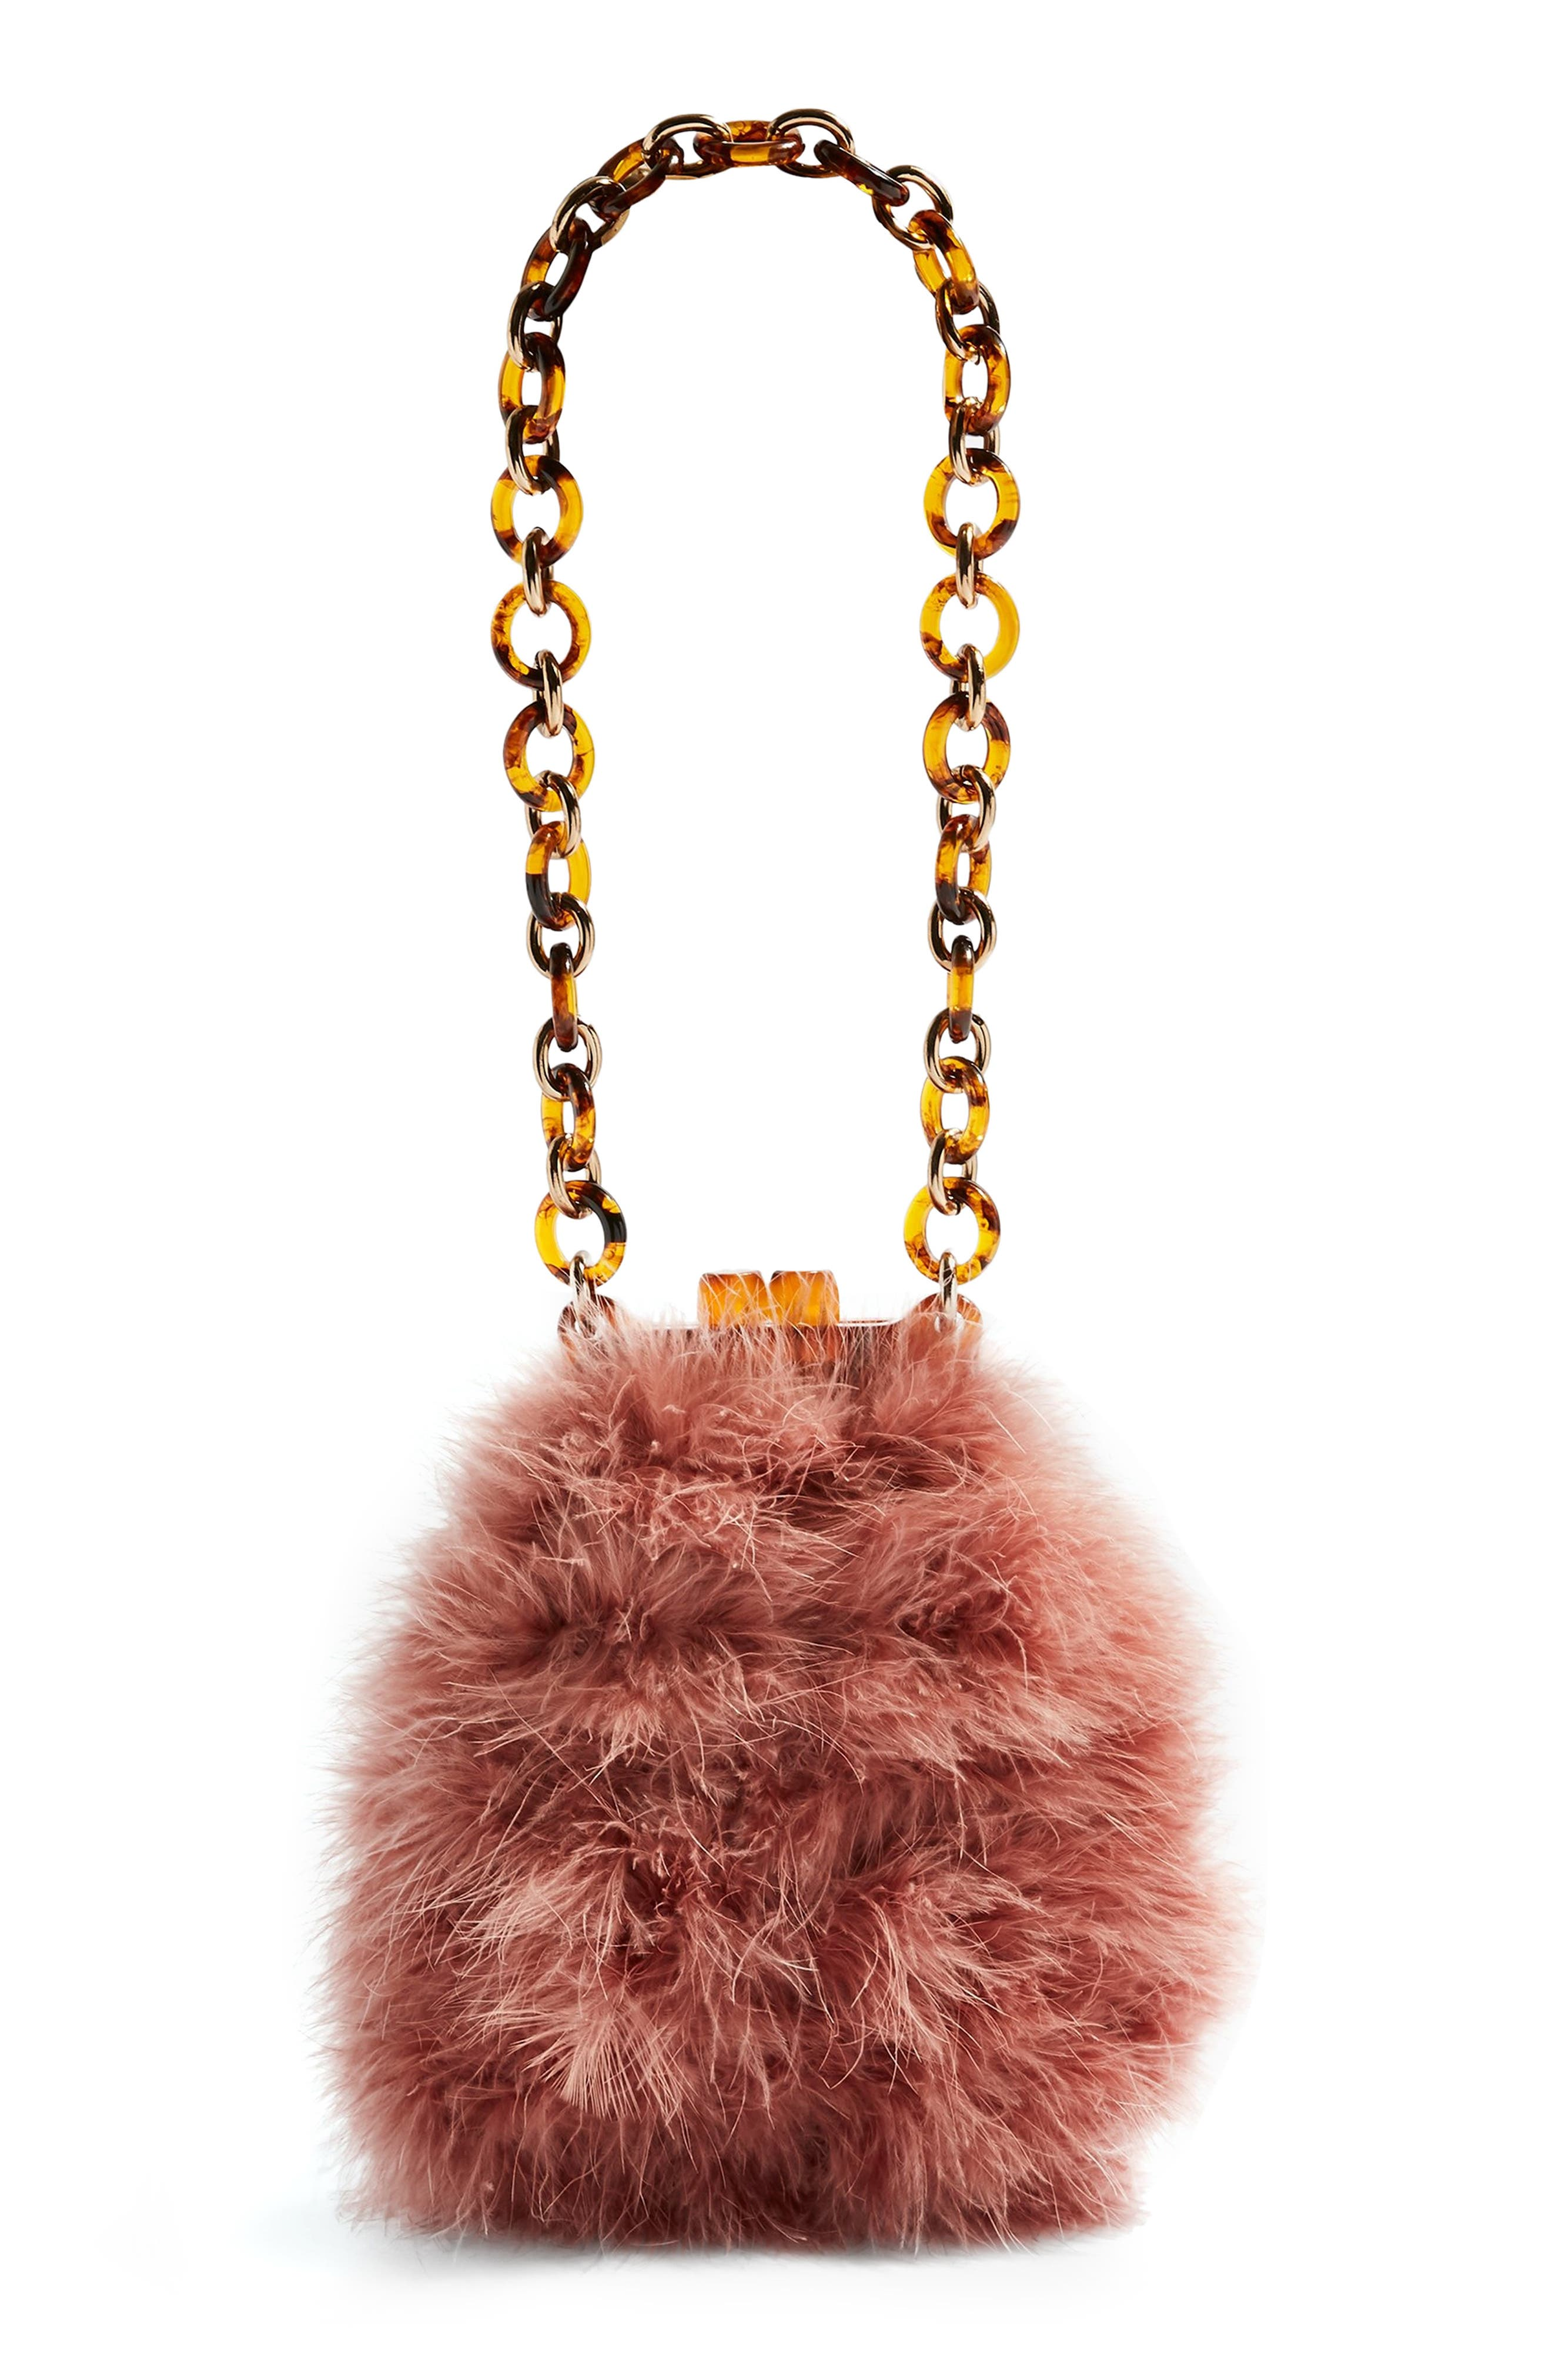 Marabou Feather Frame Handbag,                             Main thumbnail 1, color,                             PINK MULTI